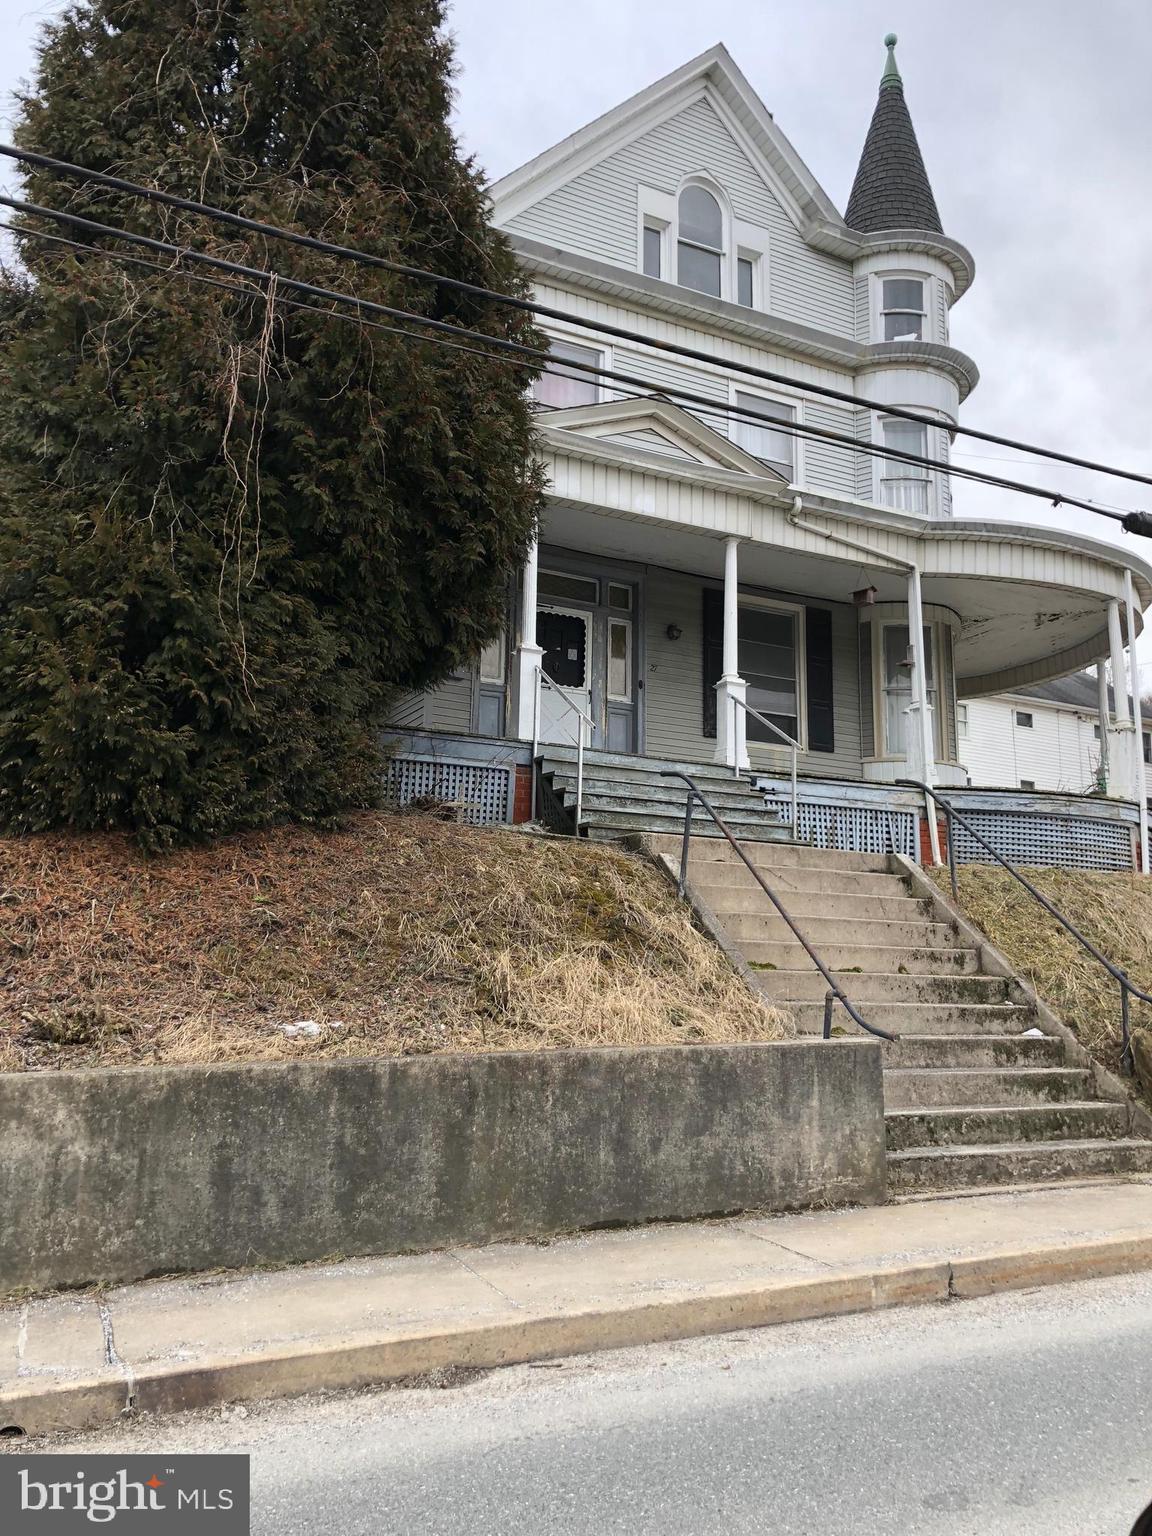 27 W MAIN STREET, WINDSOR, PA 17366